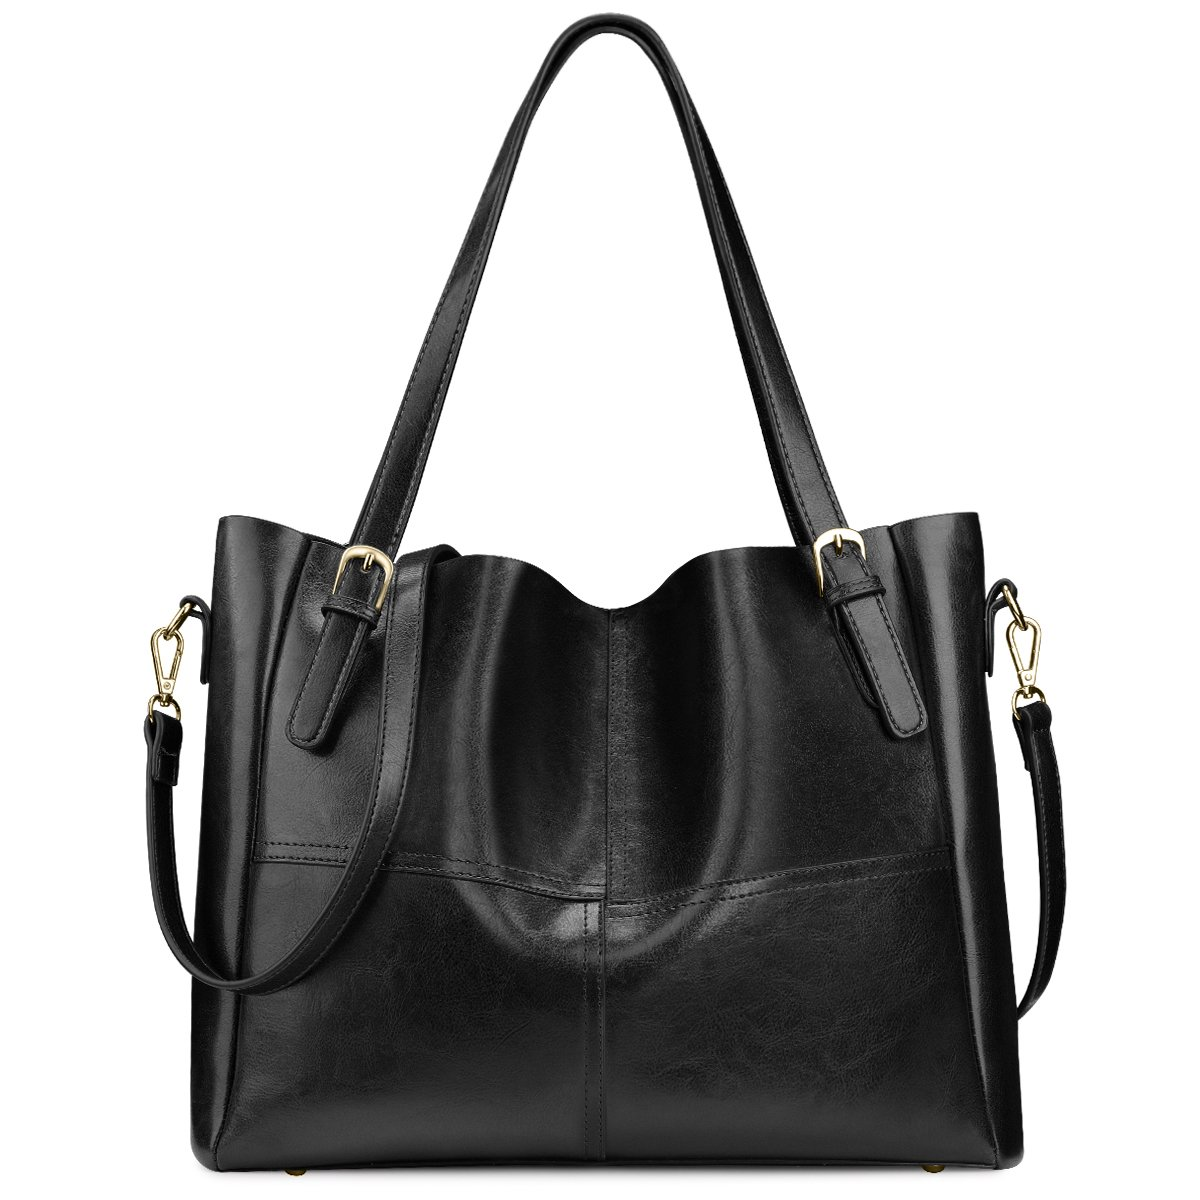 SAMSHOWME Women Top Handle Satchel Handbags Shoulder Bag PU Leather Tote Purse (Black) by SAMSHOWME